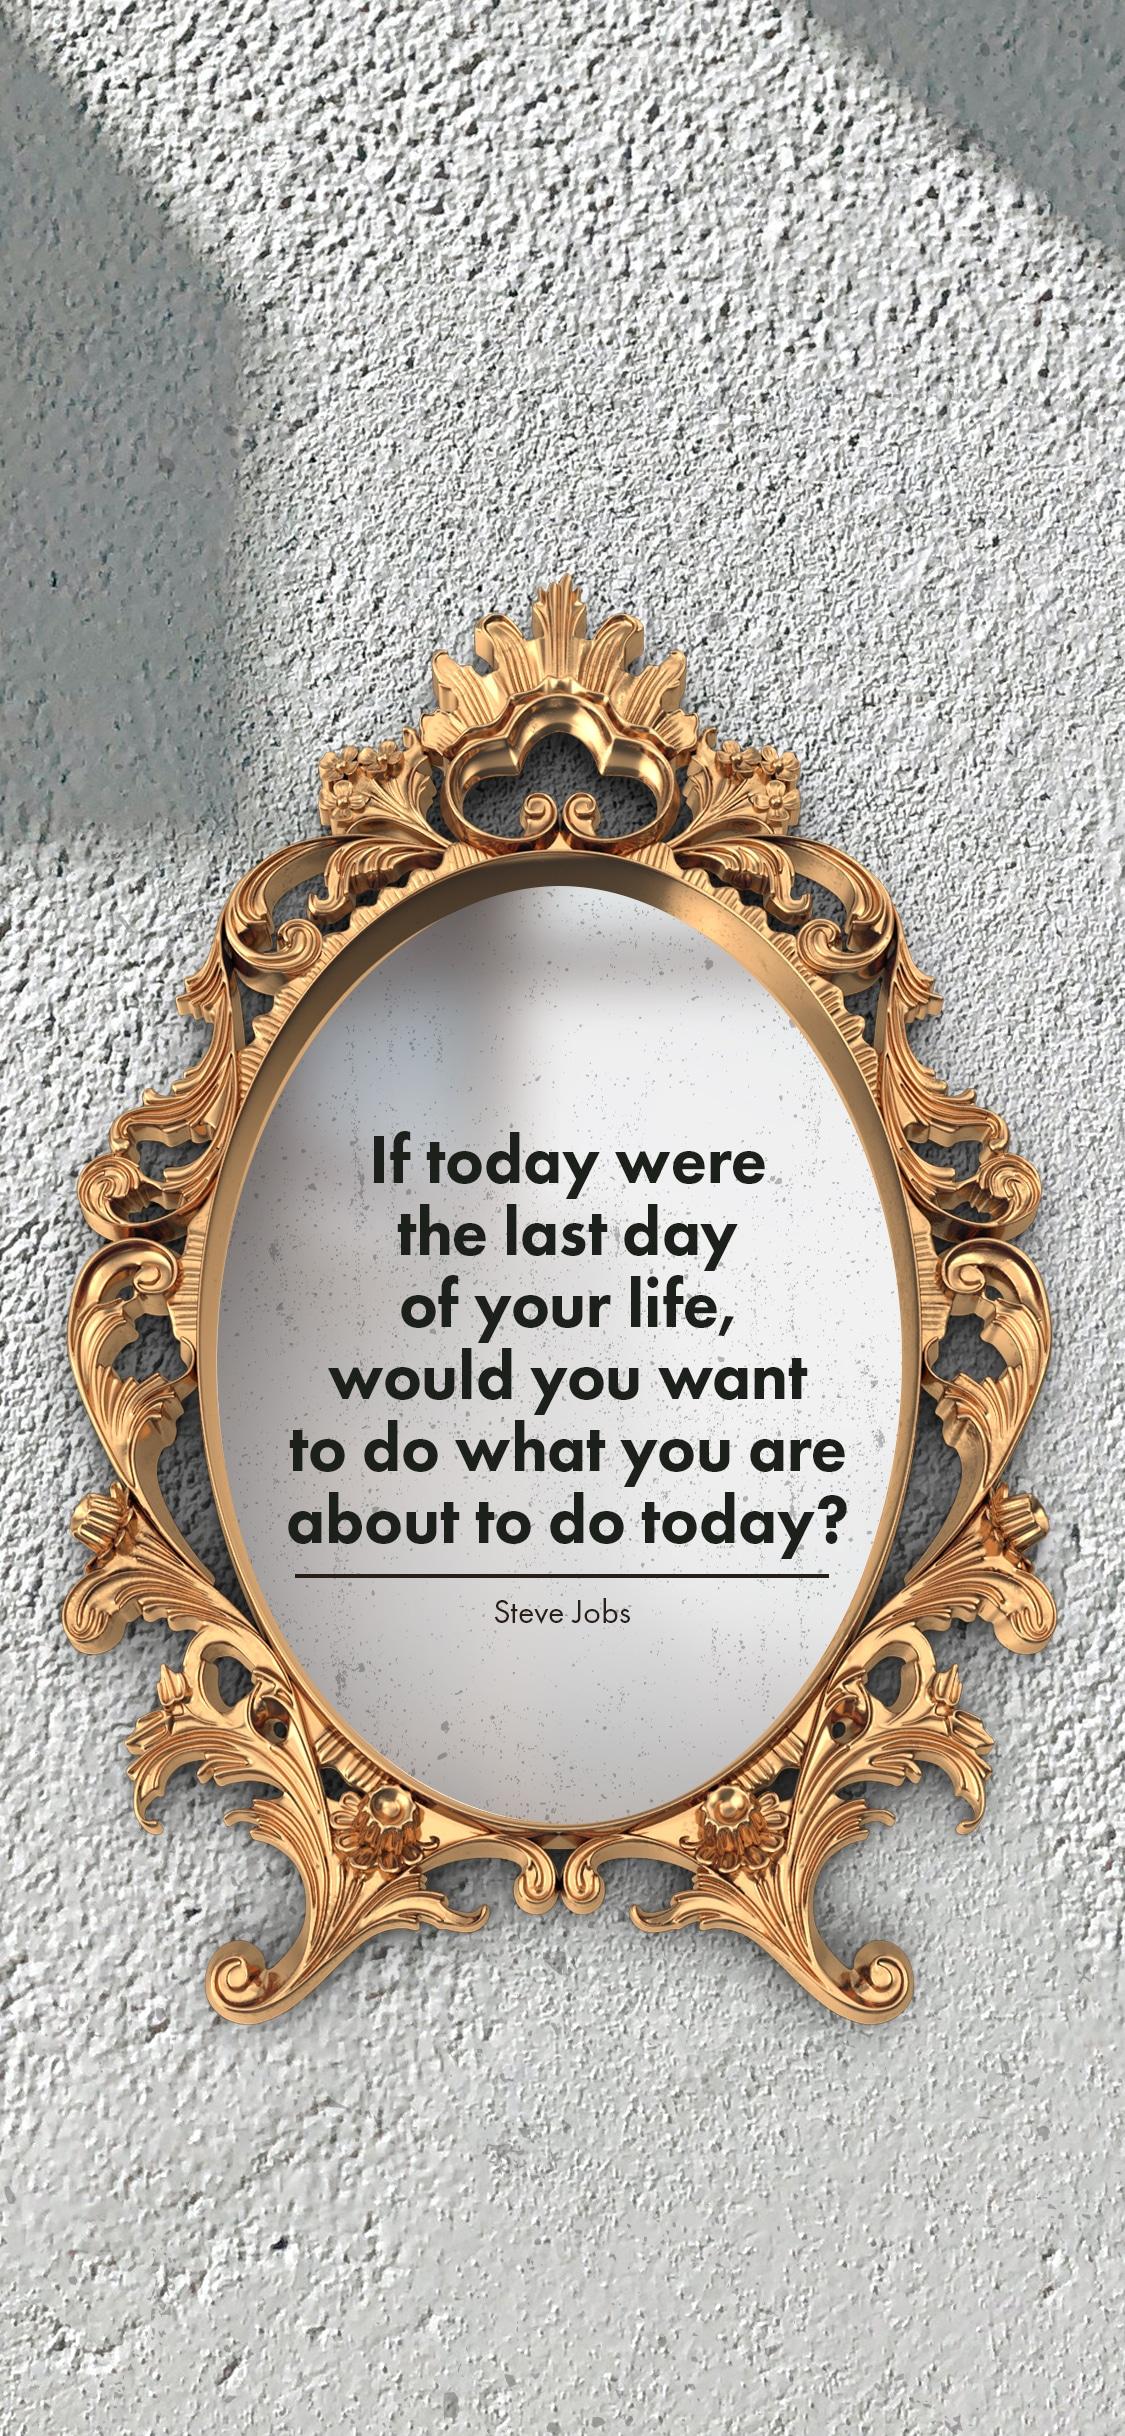 Steve Jobs Inspiring quote 5